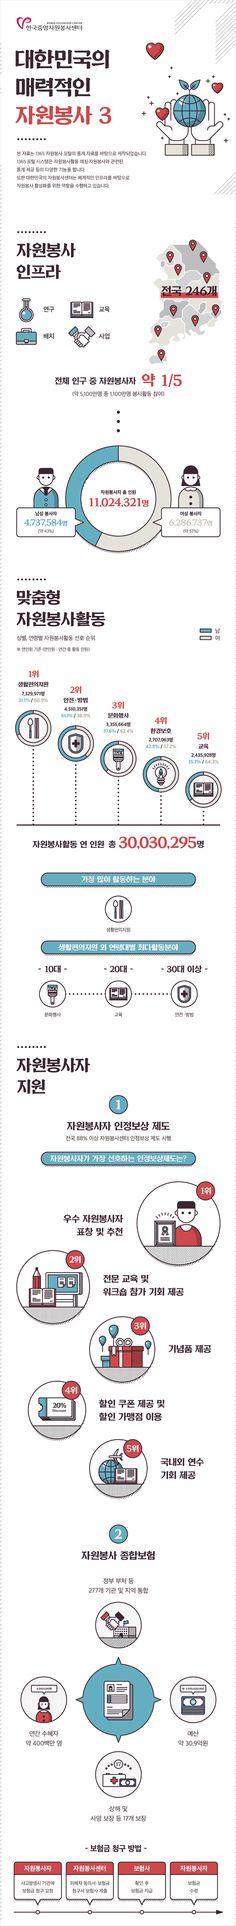 [Infographic] '대한민국의 매력적인 자원봉사 3'에 대한 인포그래픽